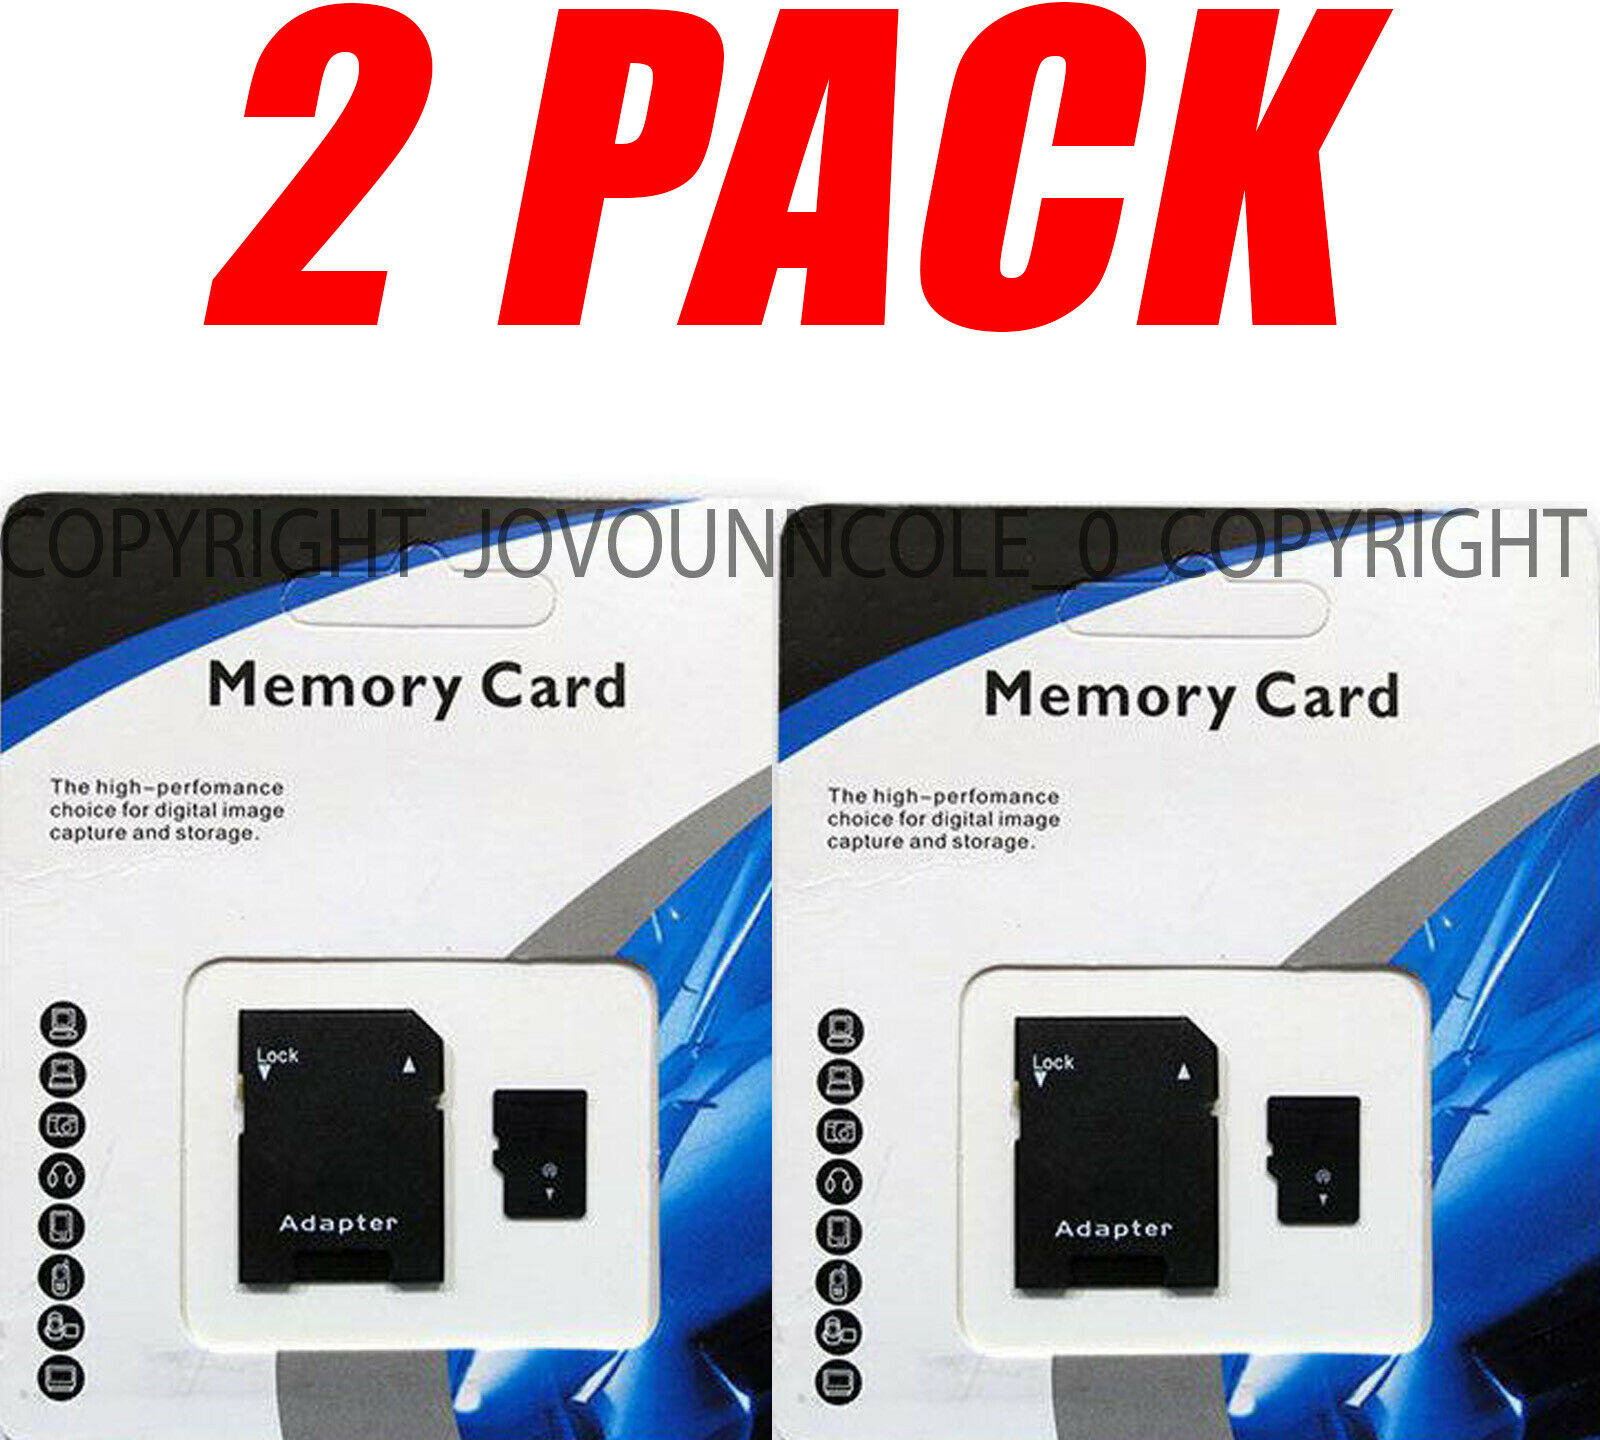 2 Pack 1TB micro MEMORY CARD Class 10 TF 1024GB XC Storage F